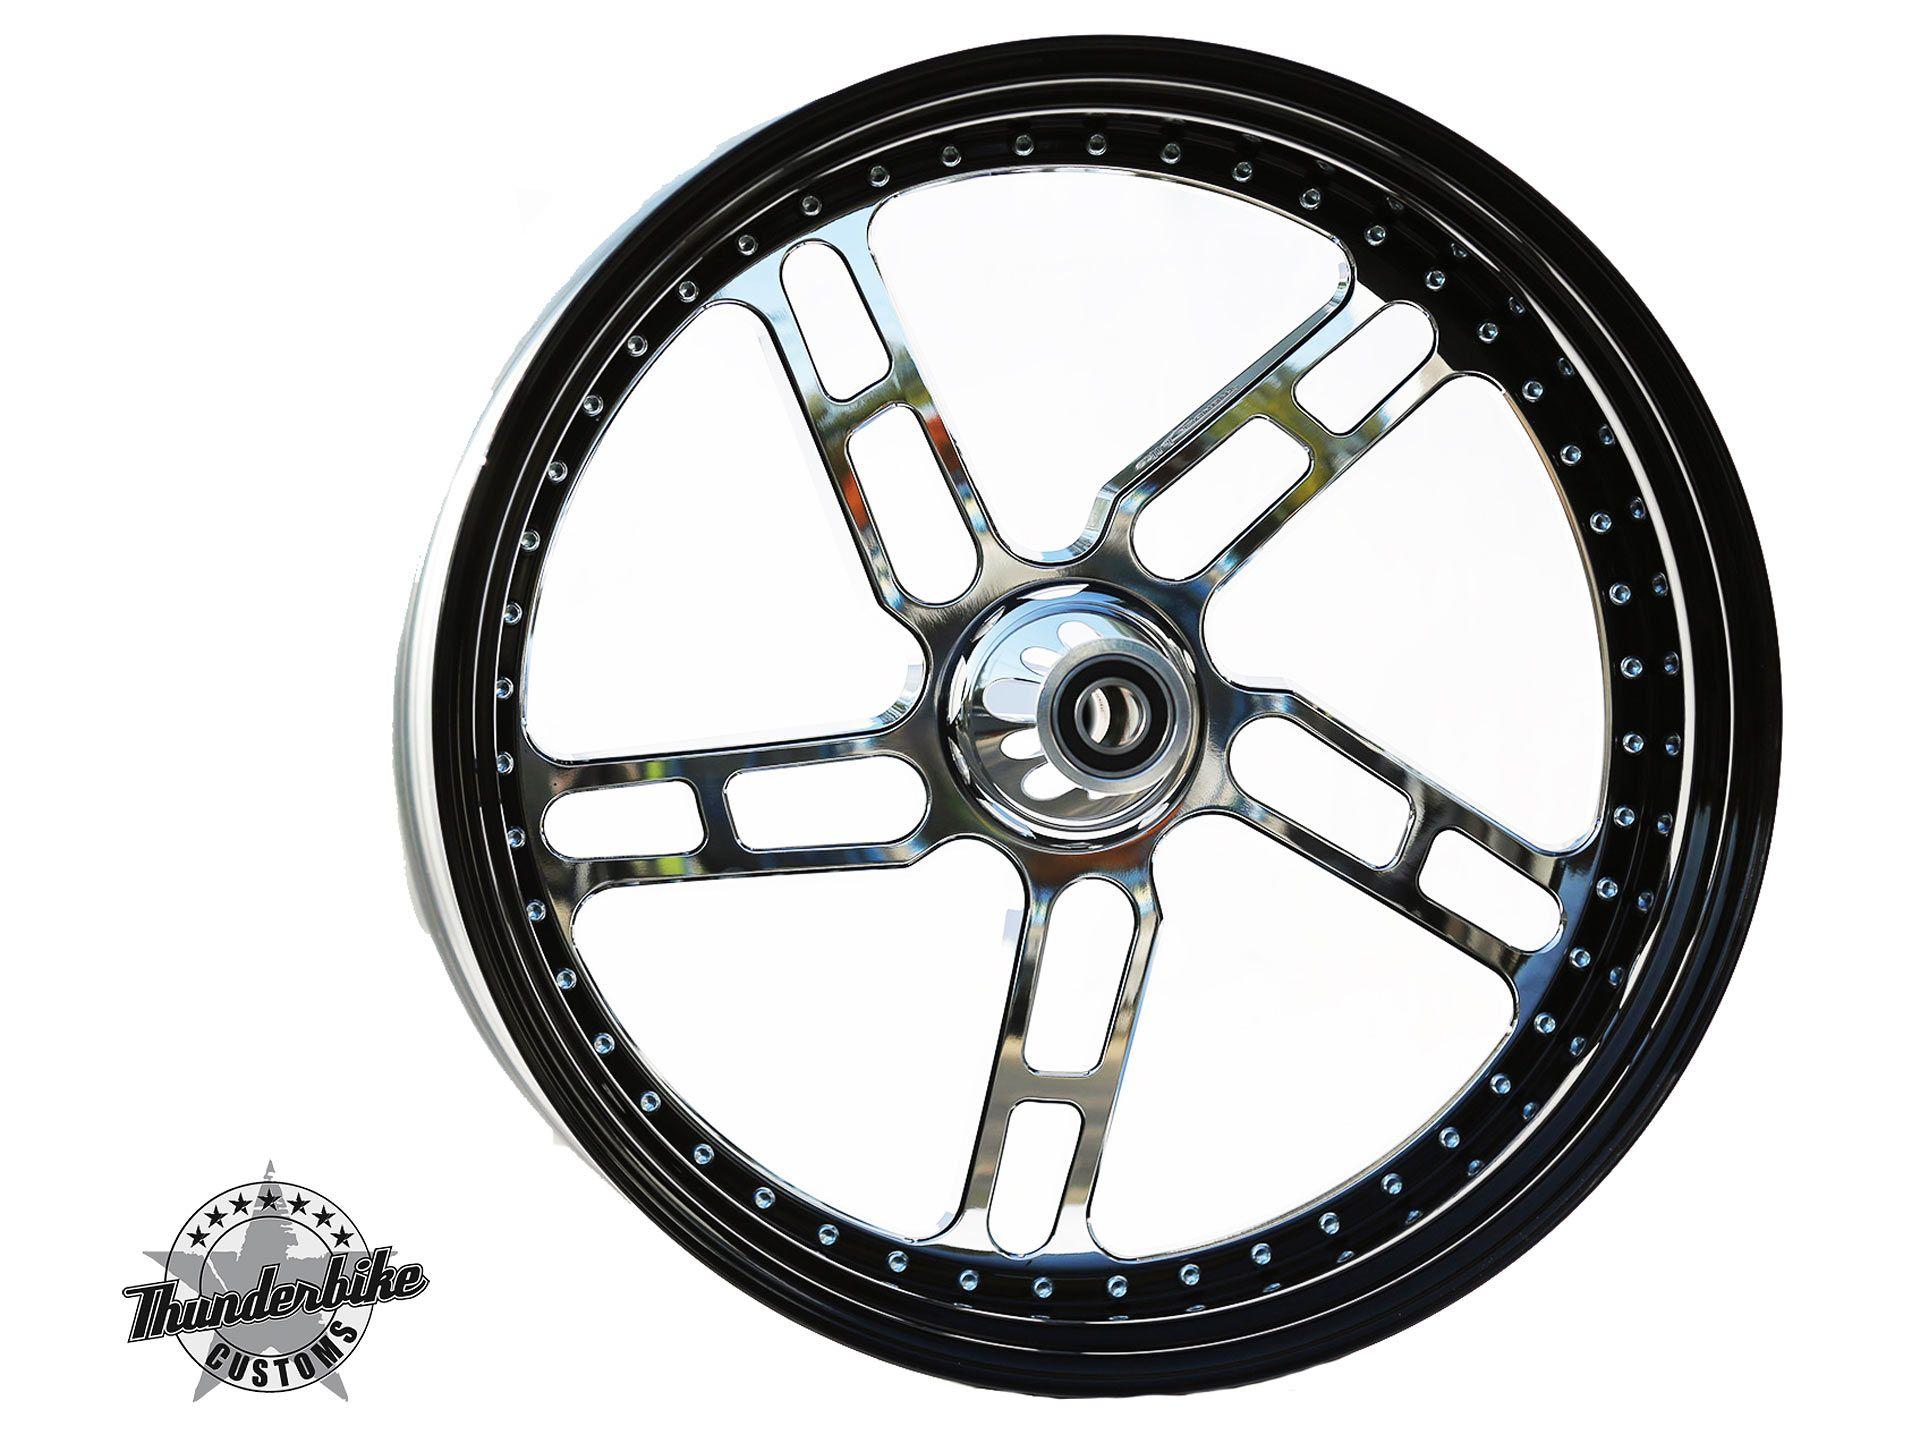 Thunderbike Big Speed Rad | Pinterest